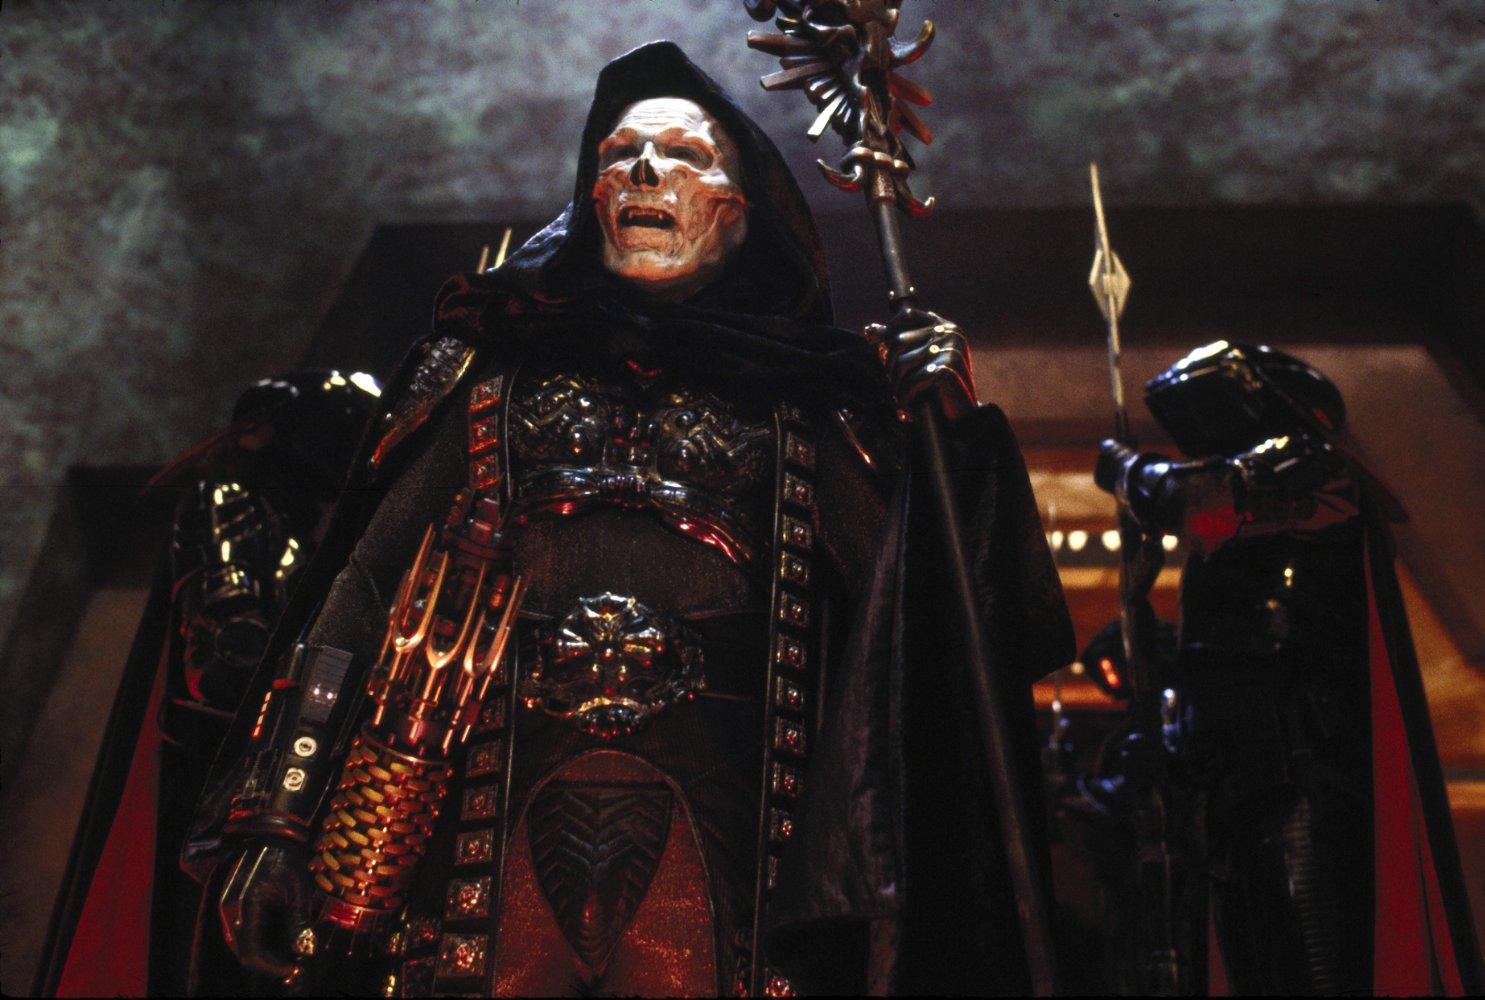 Frank Langella as Skeletor in Masters of the Universe (1987)